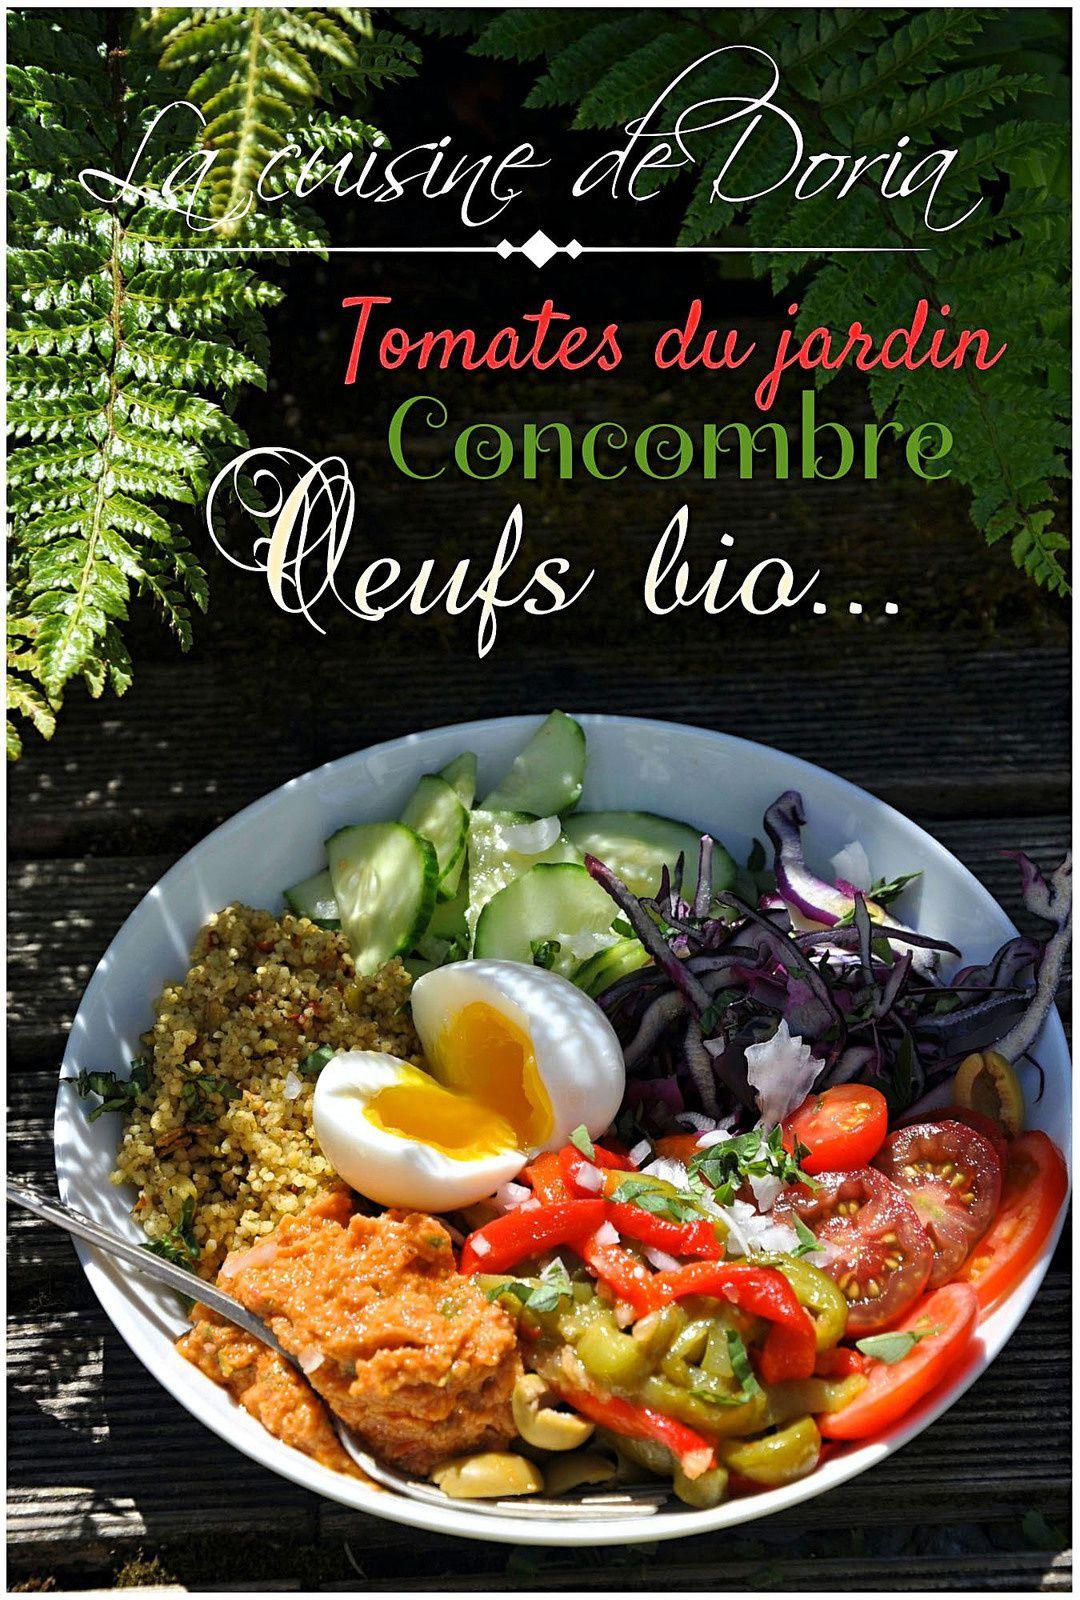 Salade mixte aux oeufs bio